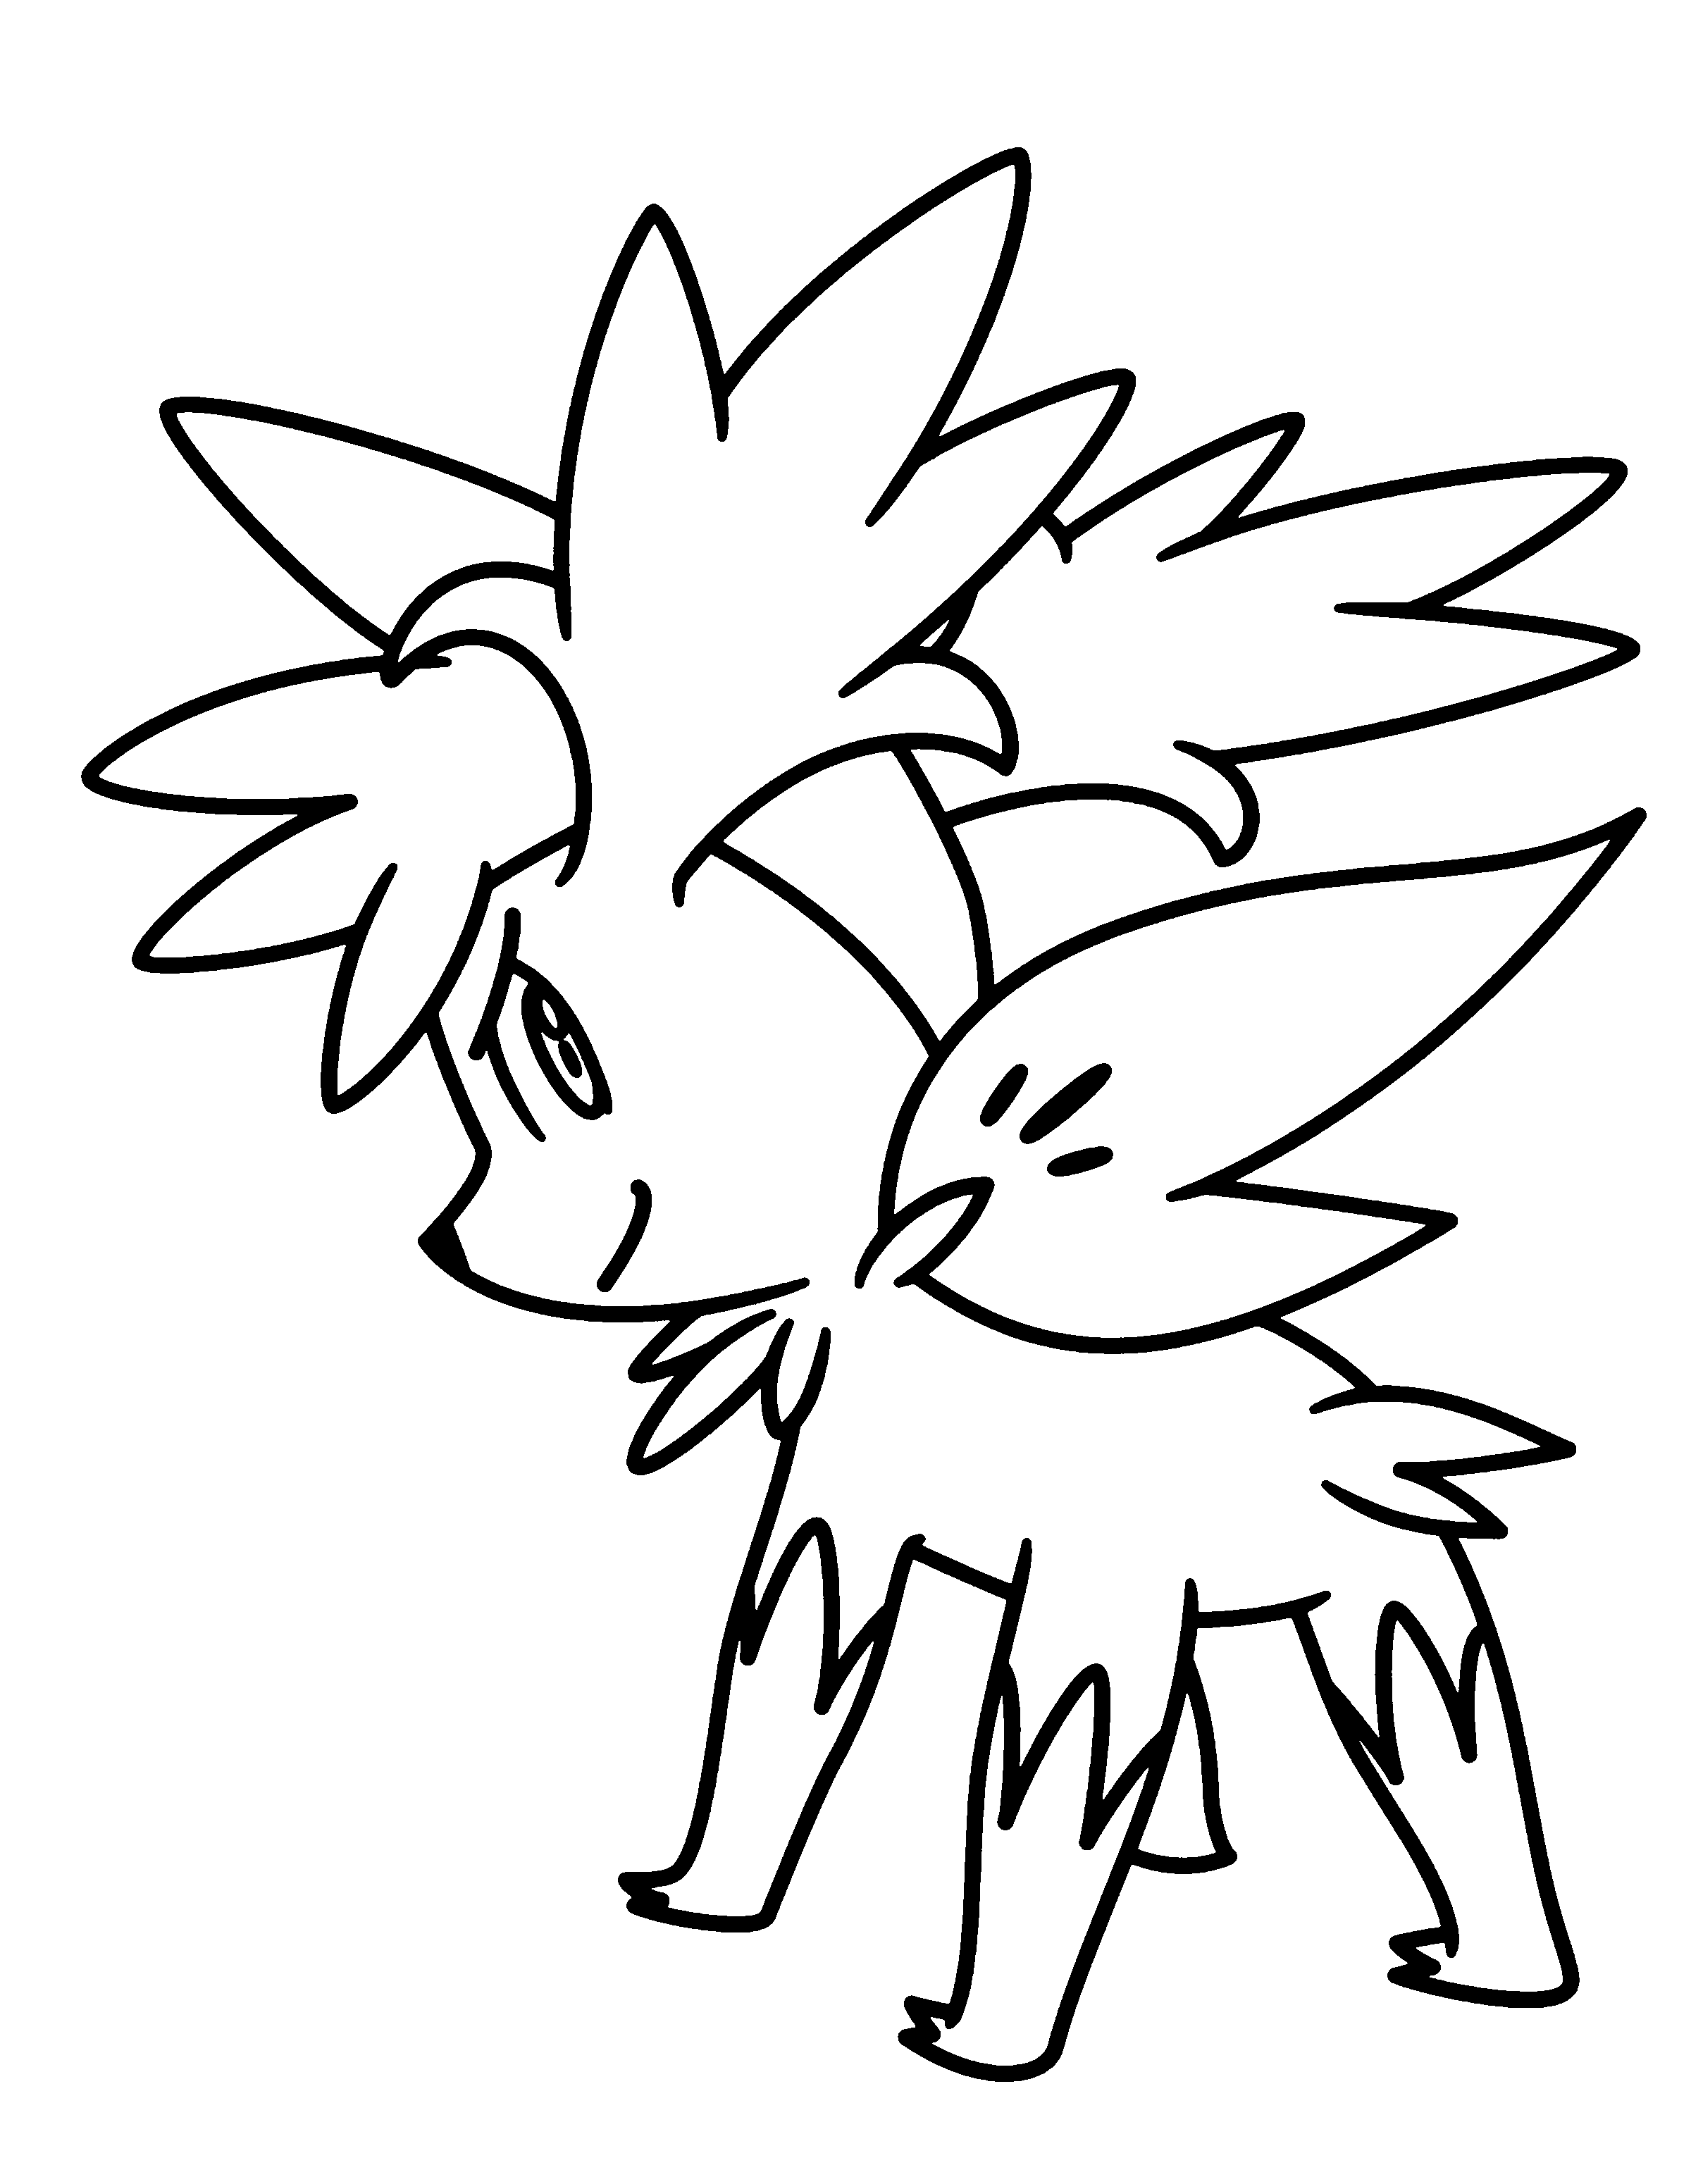 Kleurplaten Pokemon Zekrom.Diamond Vogel Wallpaper Wallpapersafari